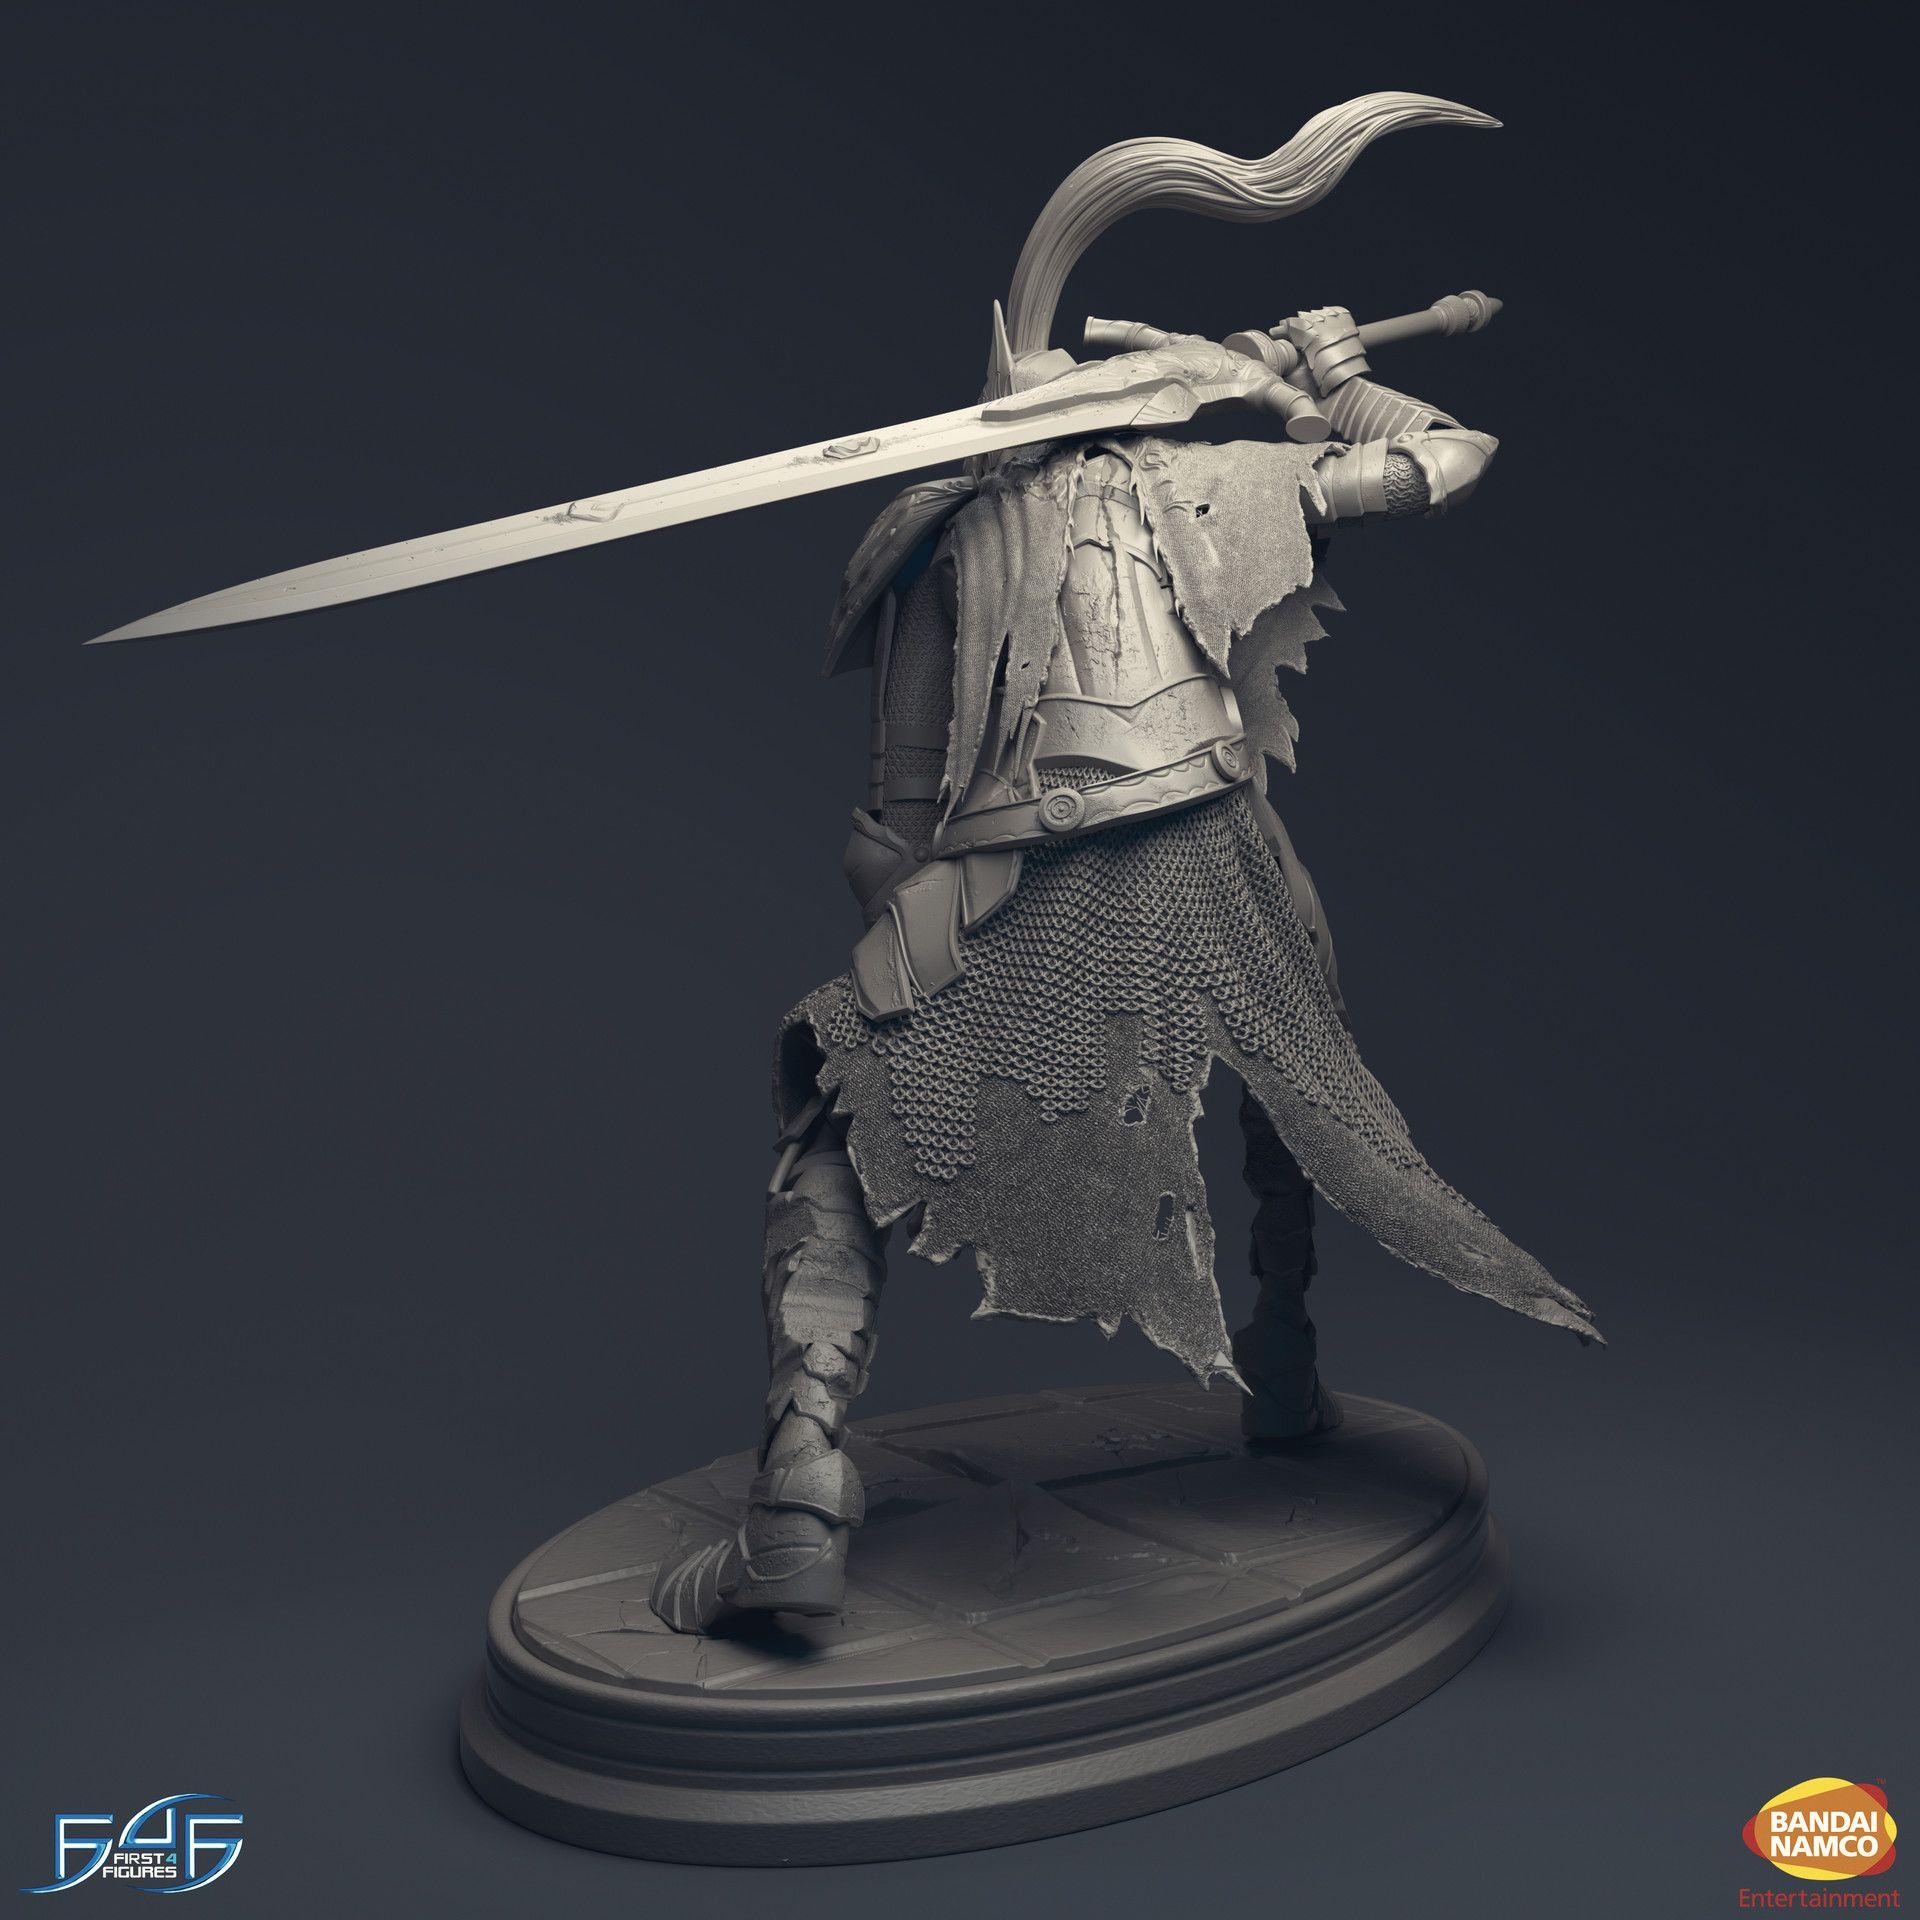 Artorias The Abysswalker 3D Art by Yogesh Sharma YOGESH